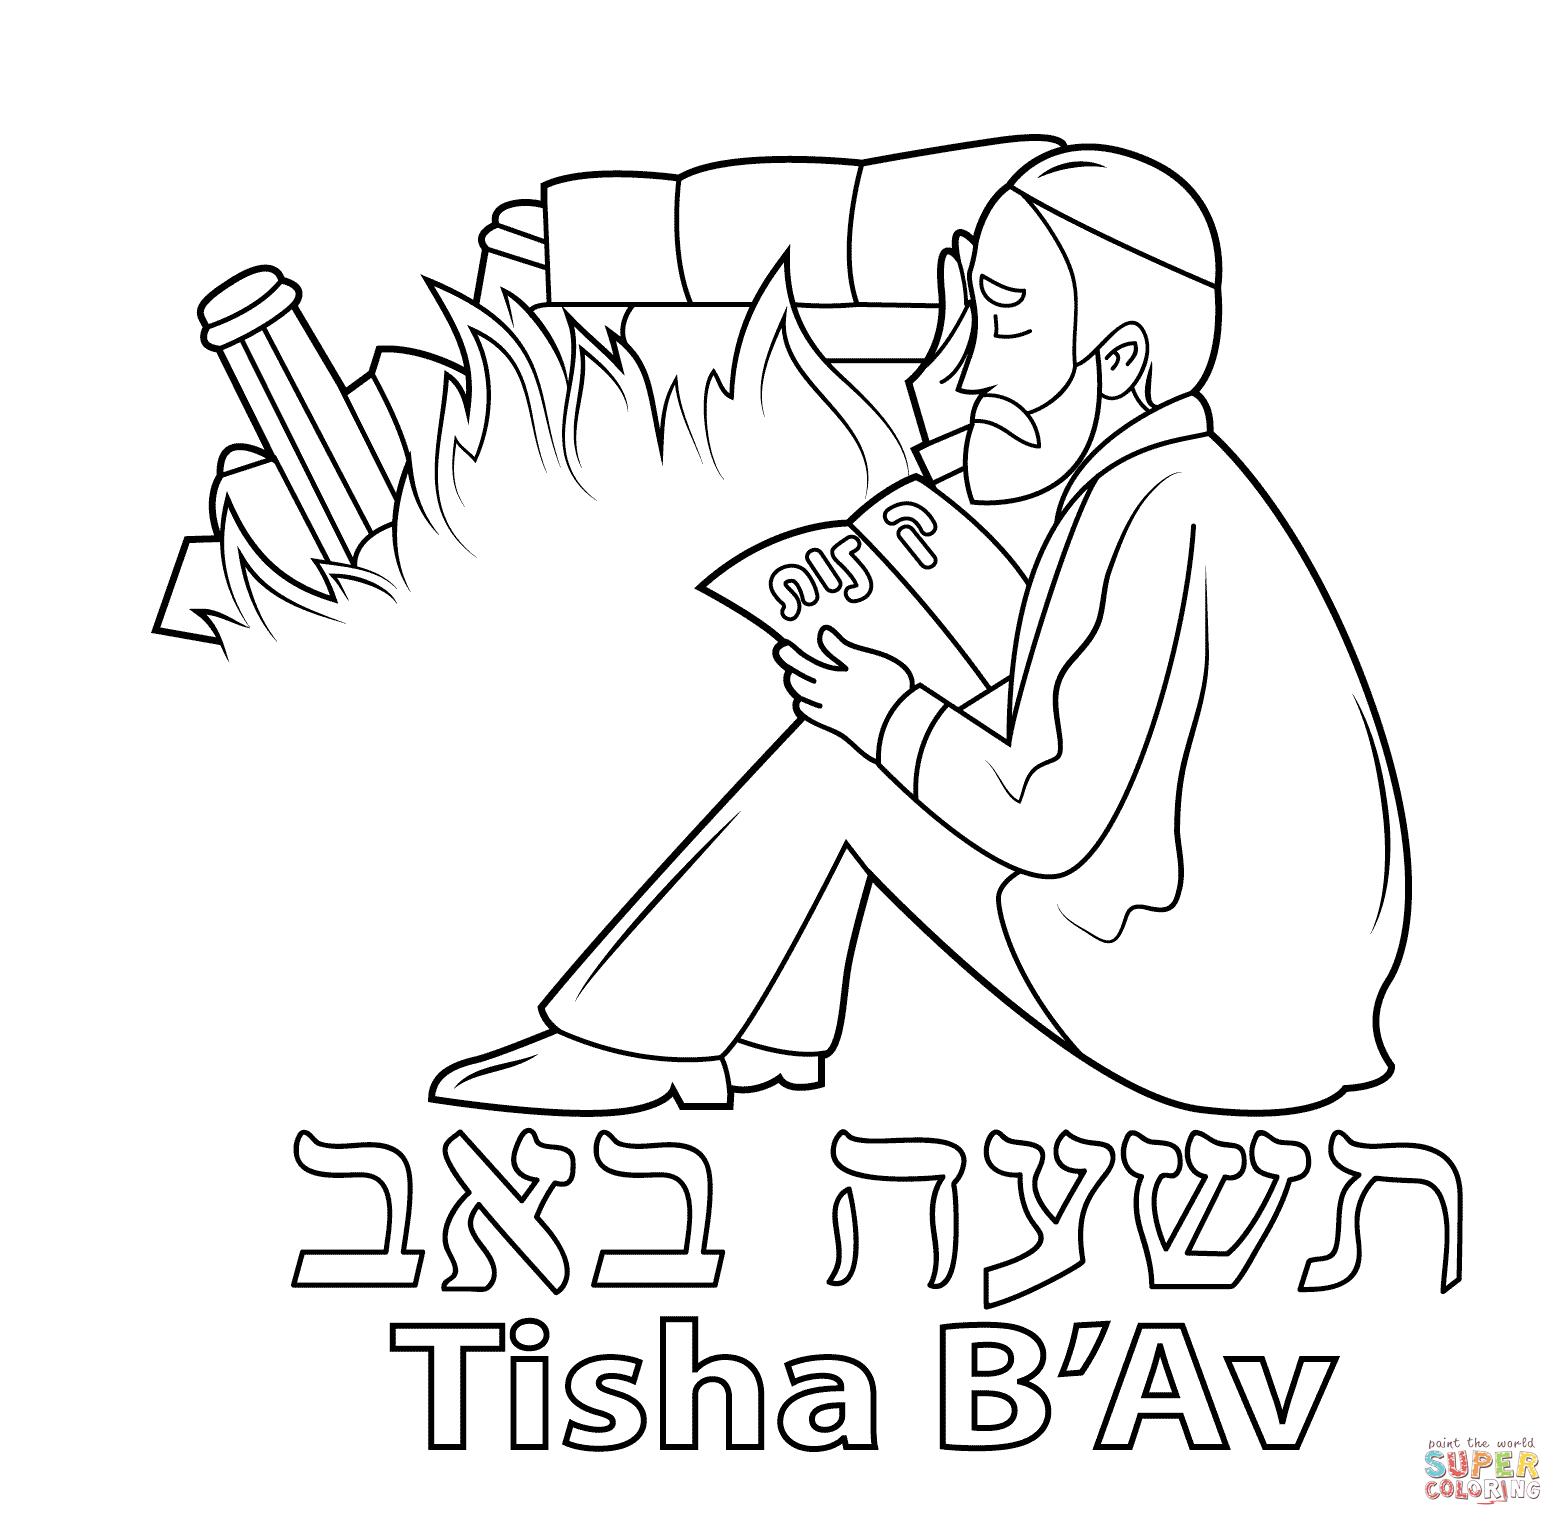 kanievsky tisha bav coloring pages - photo#3